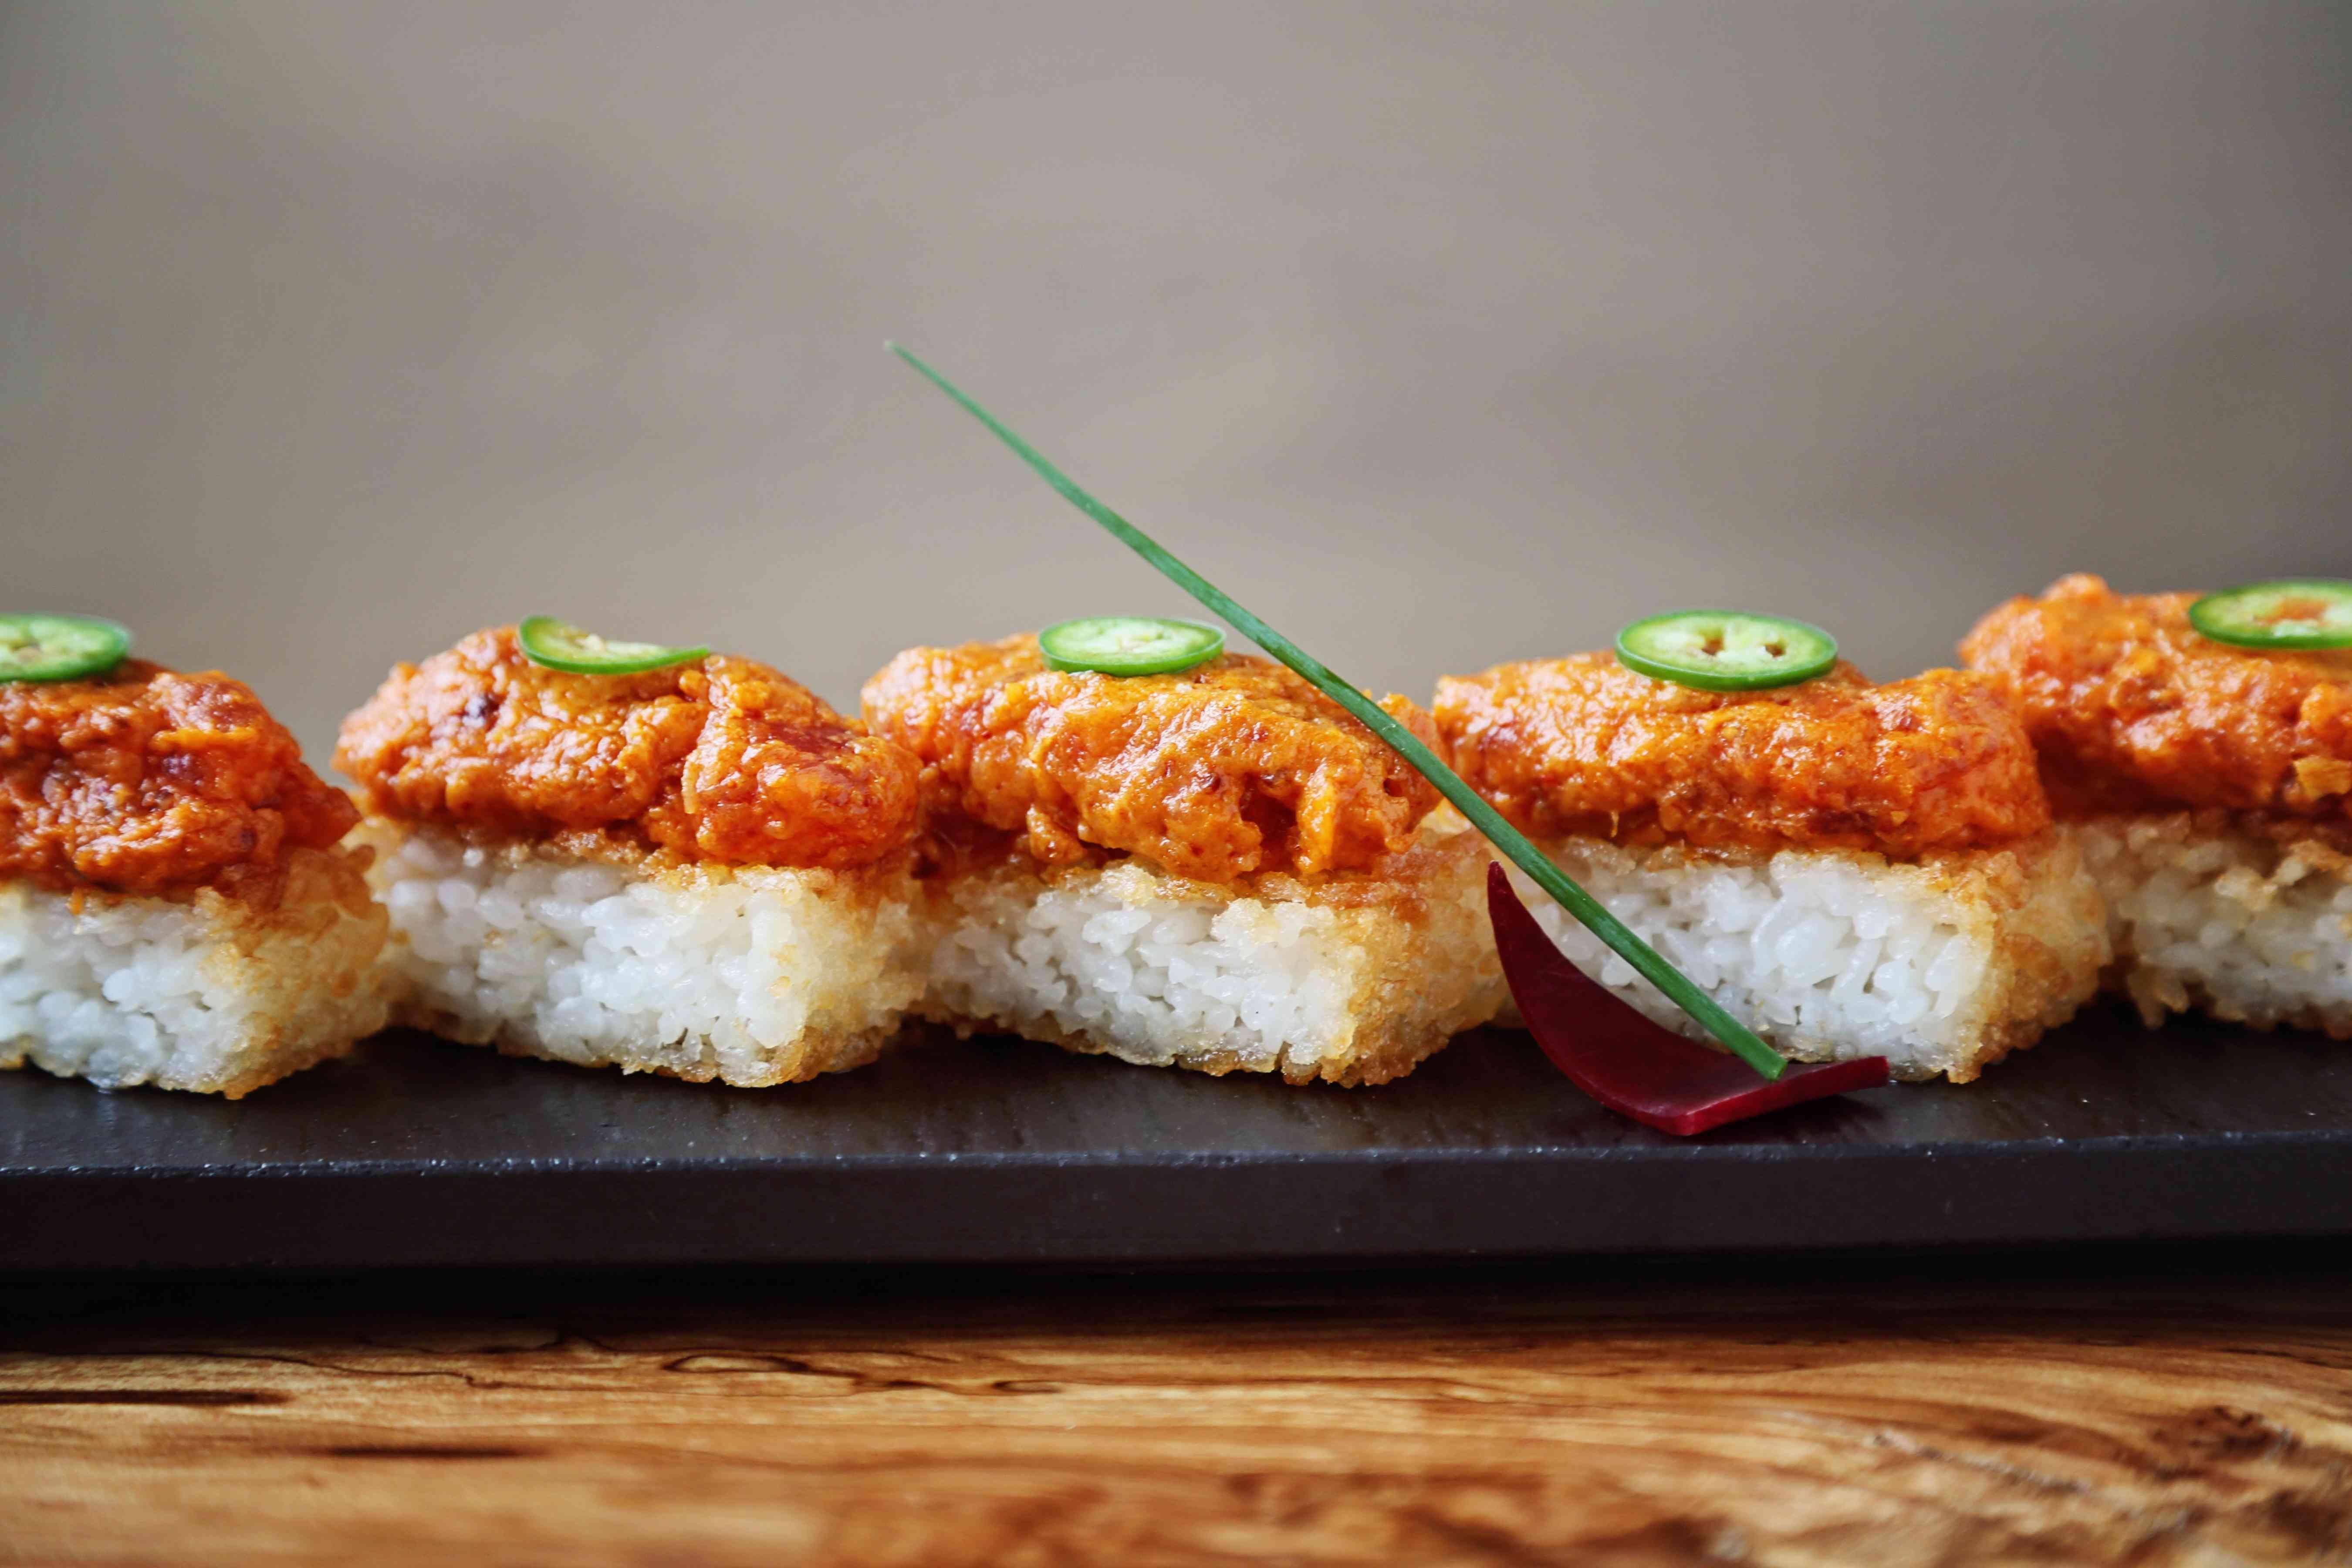 Spicy tuna on crispy rice at Umi